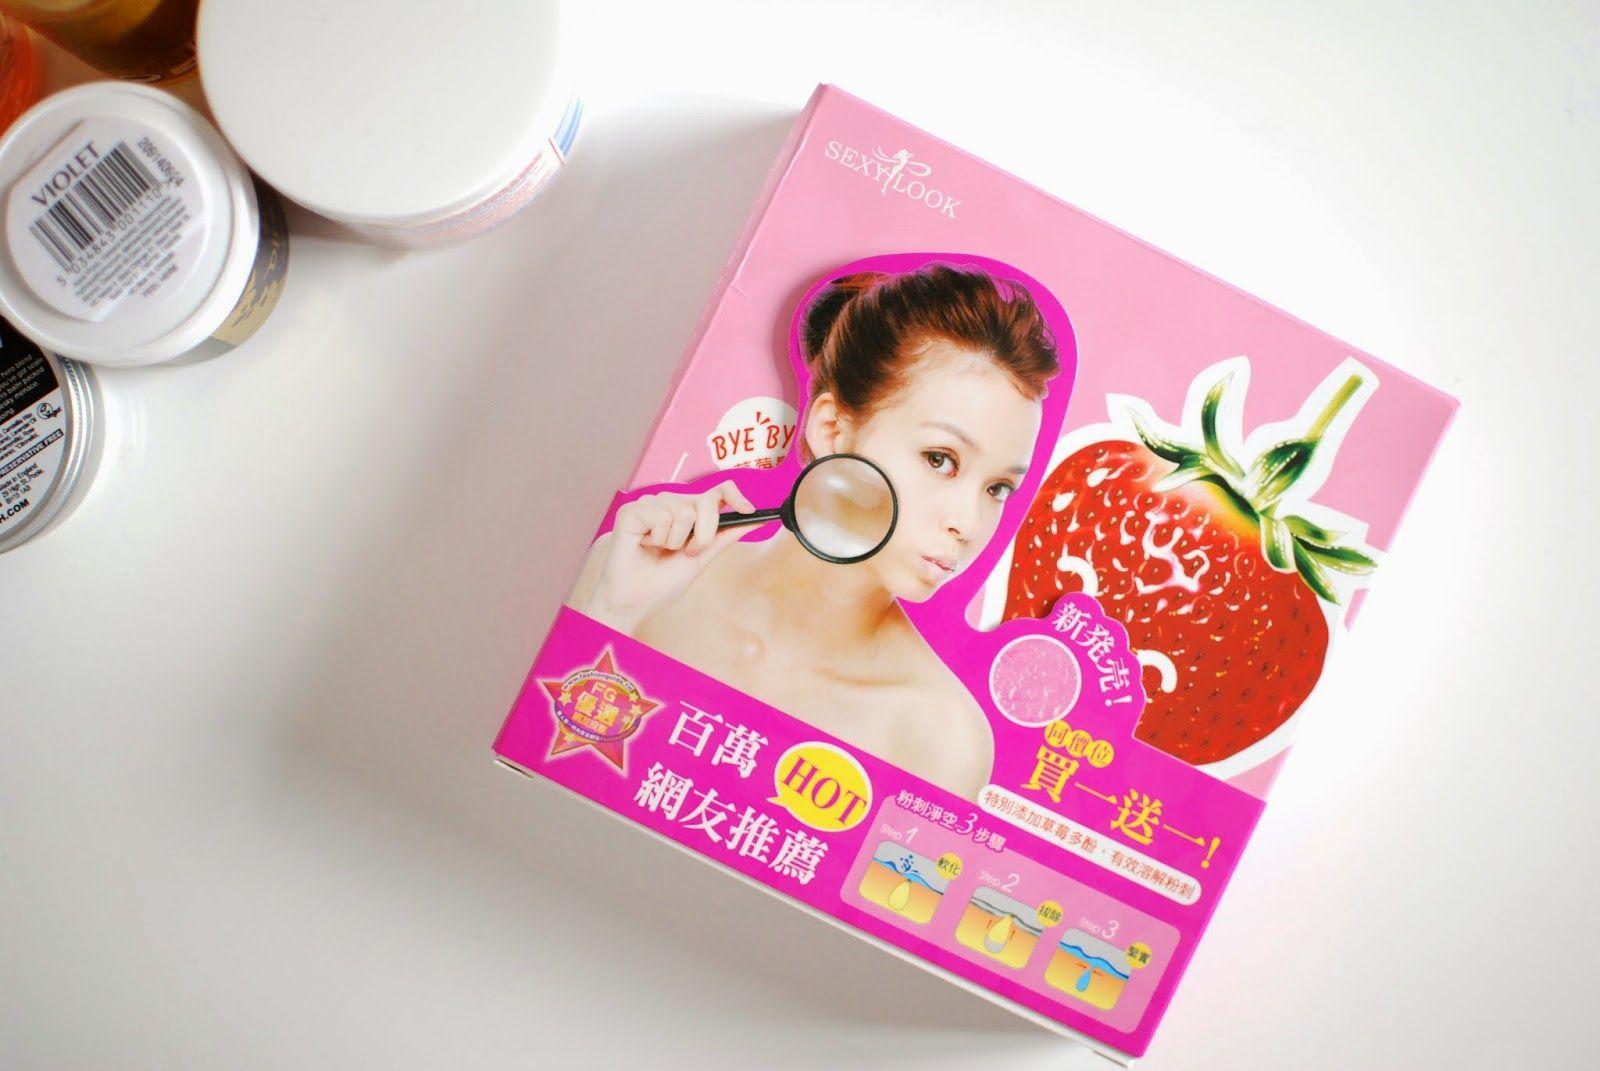 Sexylook blackhead pore cleansing set